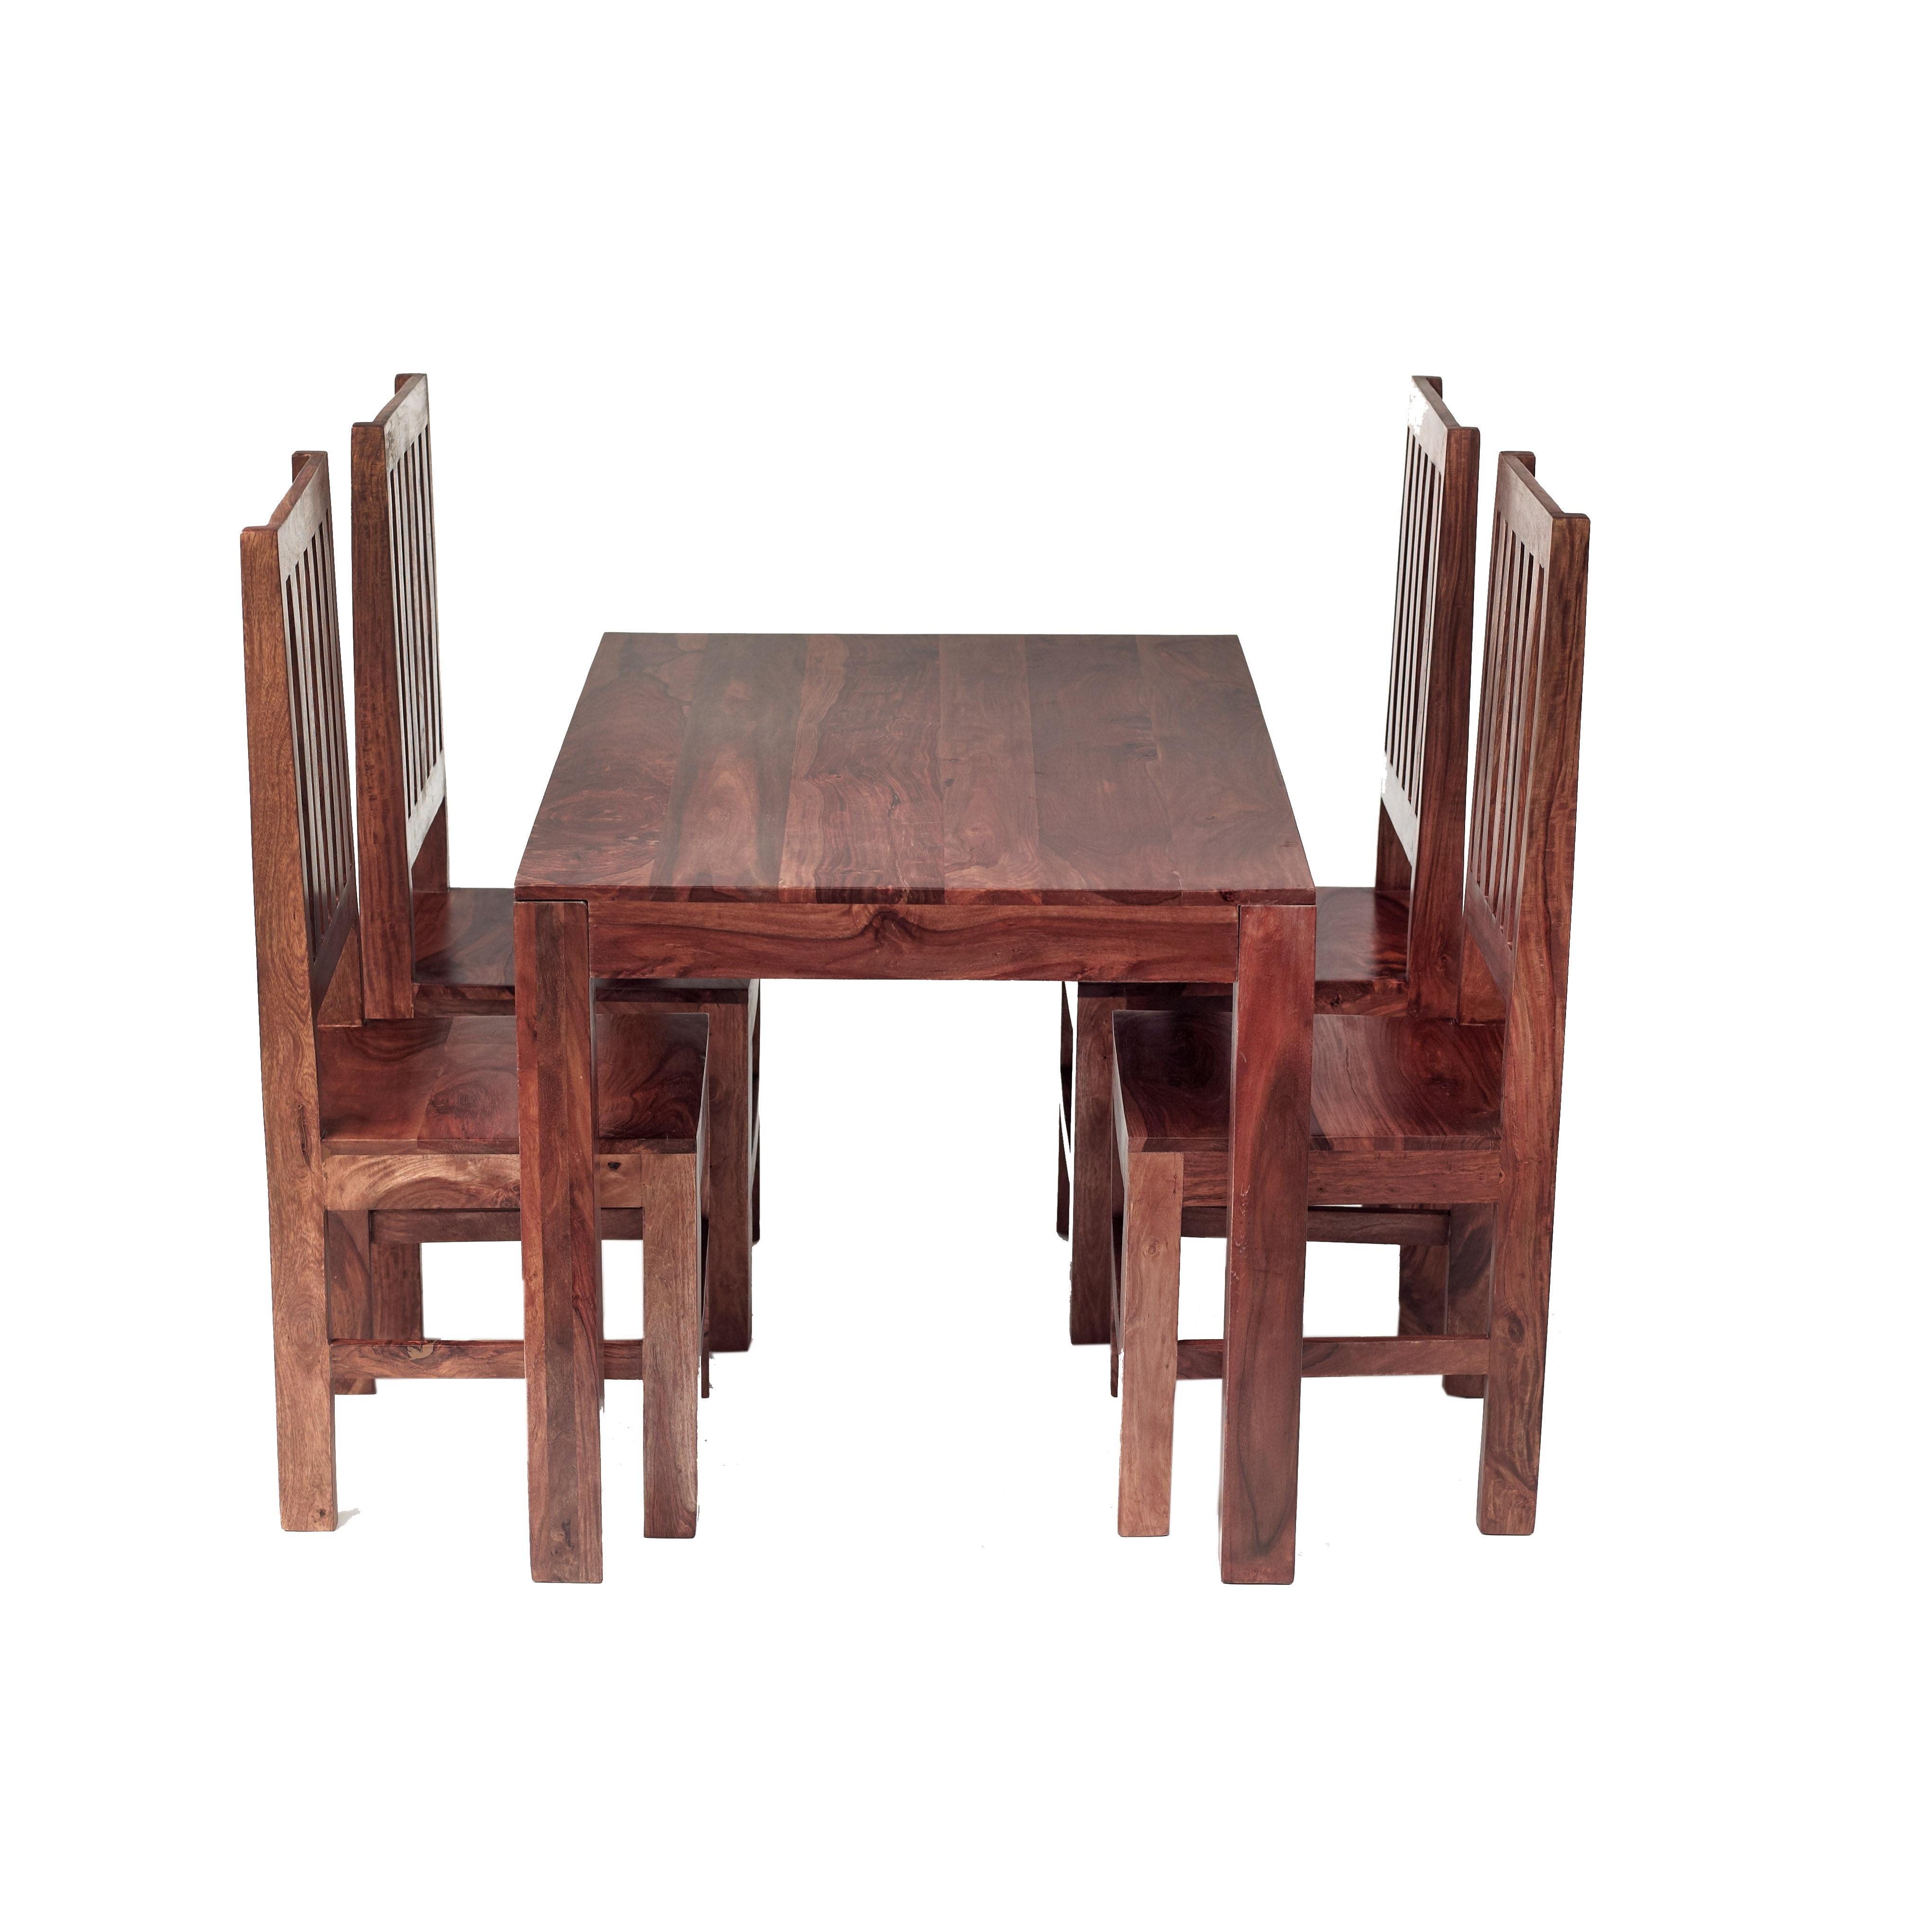 Prestington Cube Sheesham Dining Table And 4 Chairs & Reviews Inside 2017 Sheesham Dining Chairs (View 19 of 25)